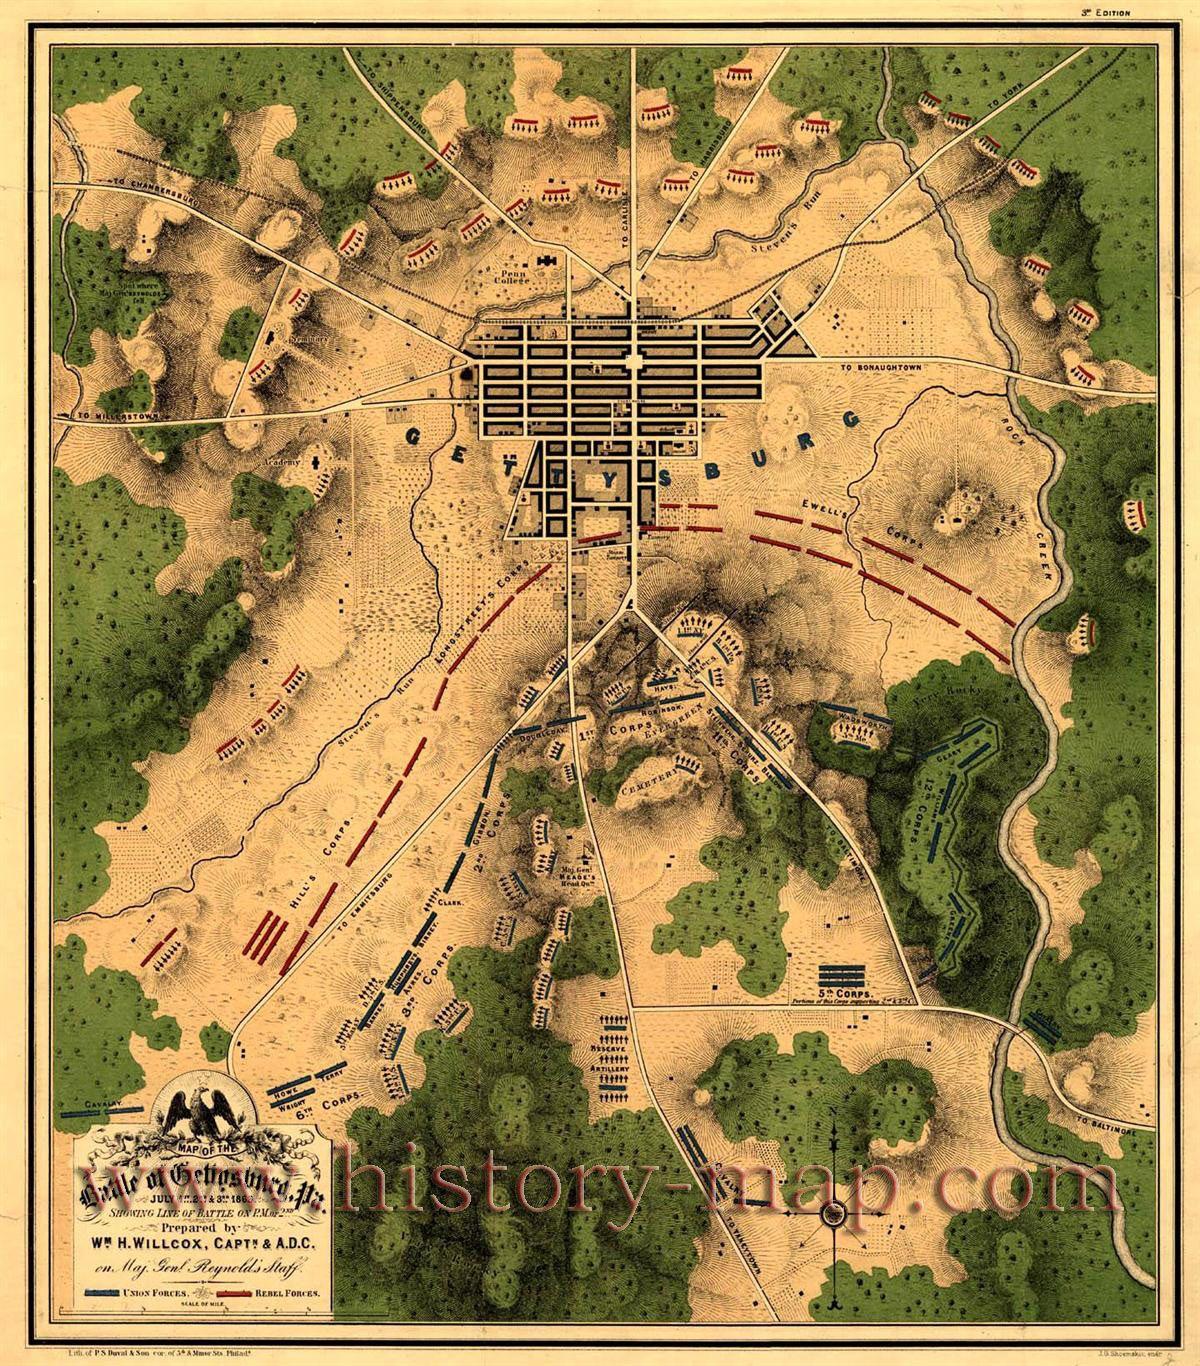 Gettysburg Battle Map Of The Battle Of Gettysburg Pa - Gettysburg pa in us map